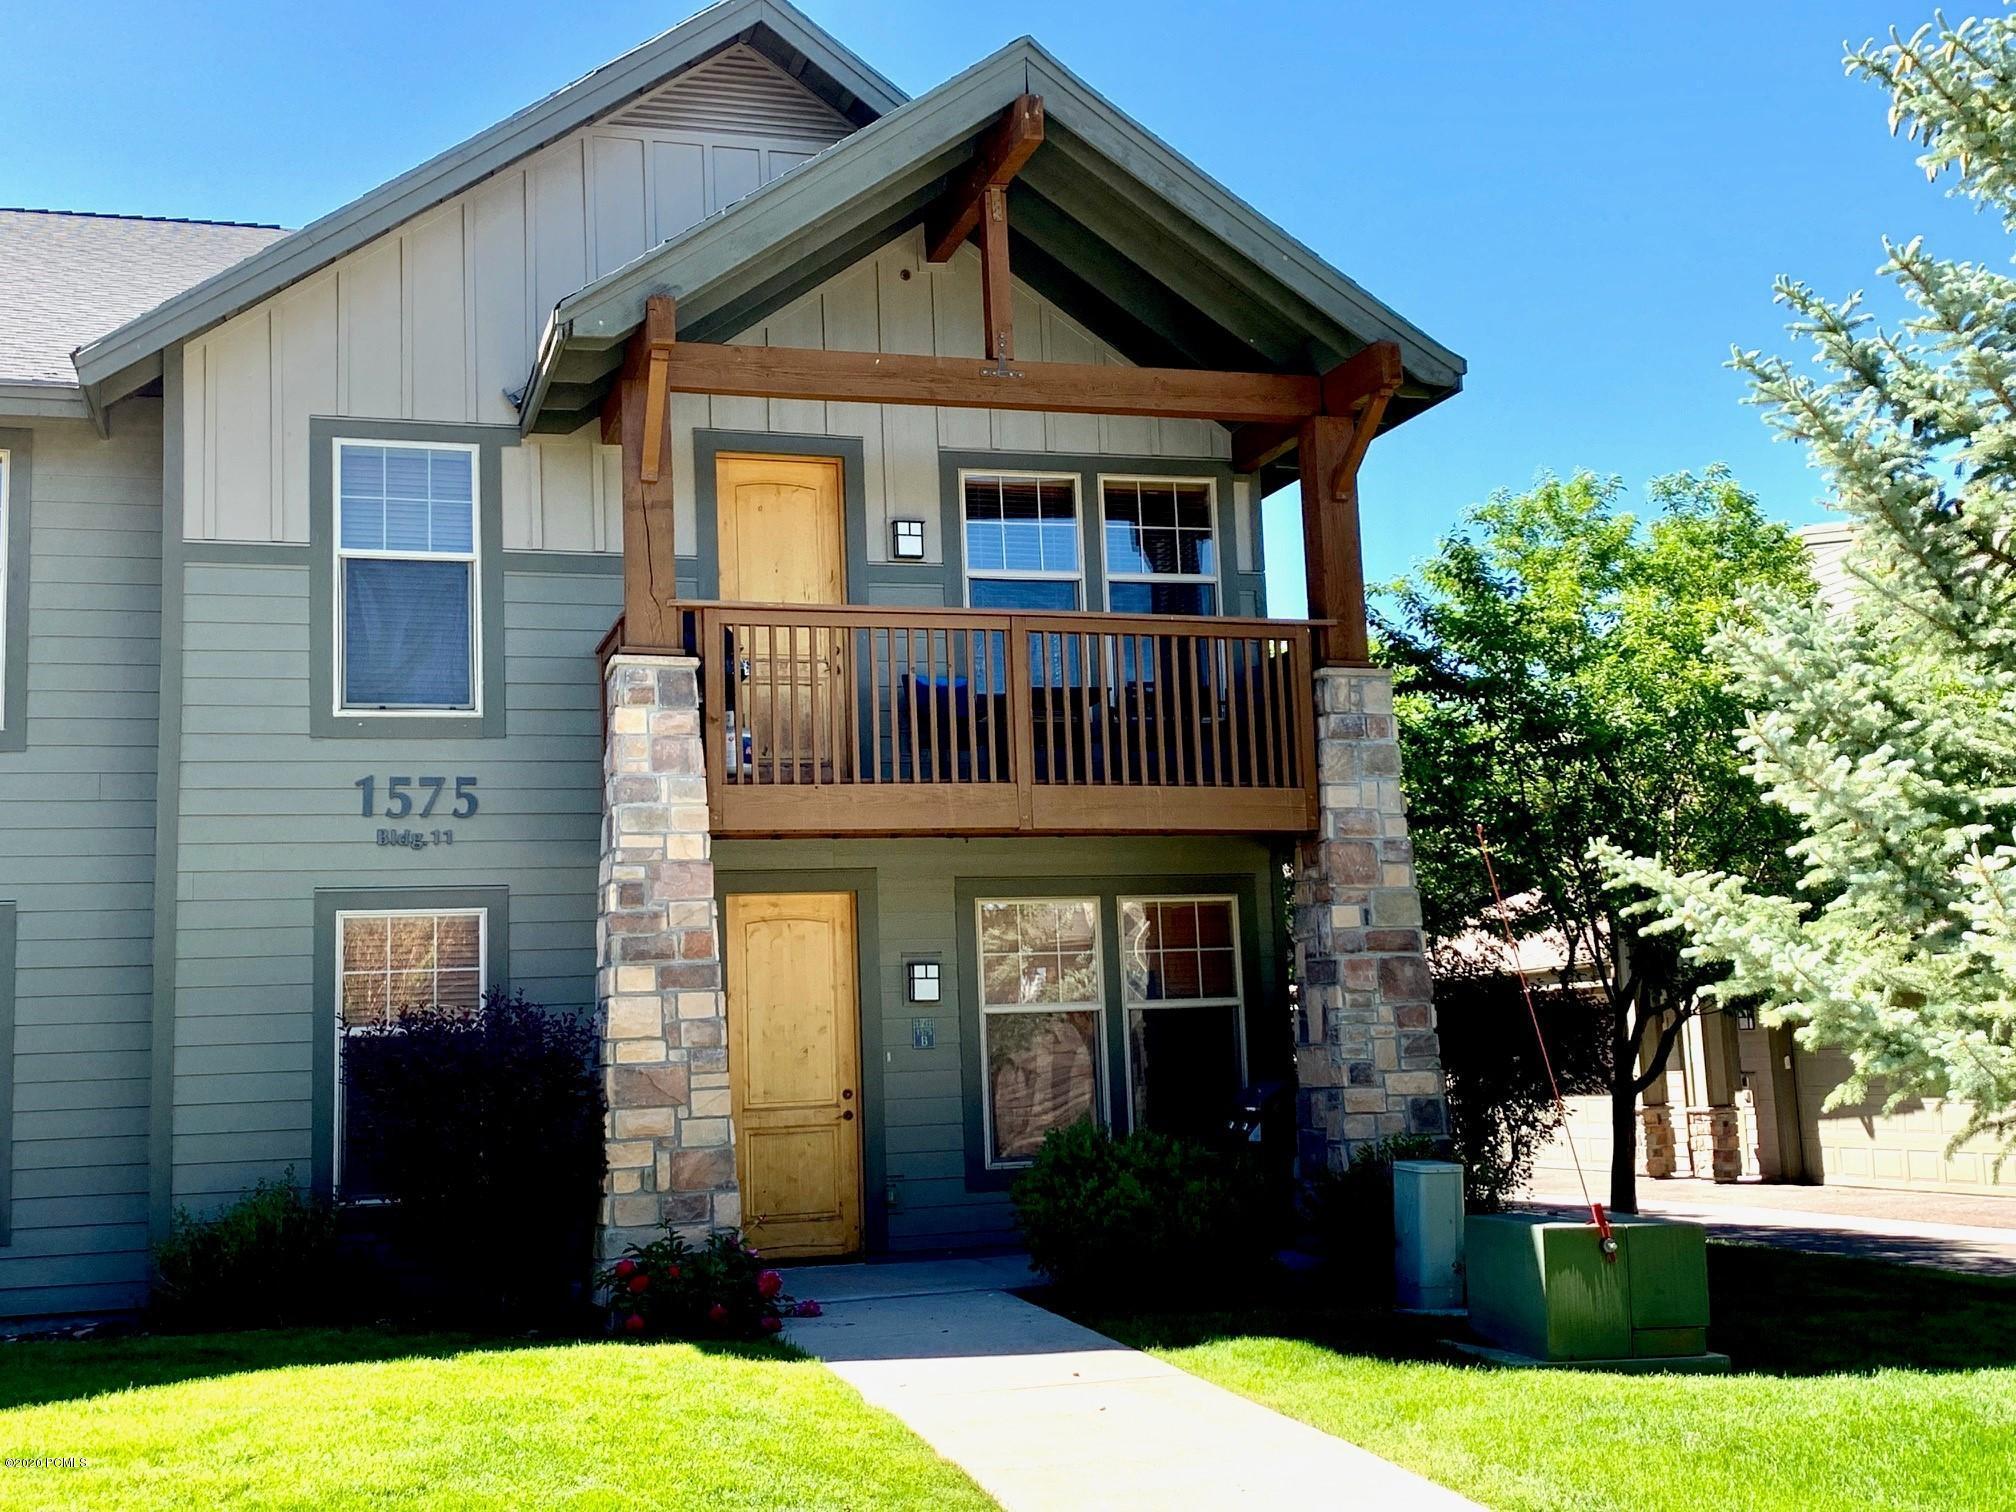 1575 Fox Hollow Lane, Park City, Utah 84098, 3 Bedrooms Bedrooms, ,2 BathroomsBathrooms,Condominium,For Sale,Fox Hollow,20190109112430415765000000